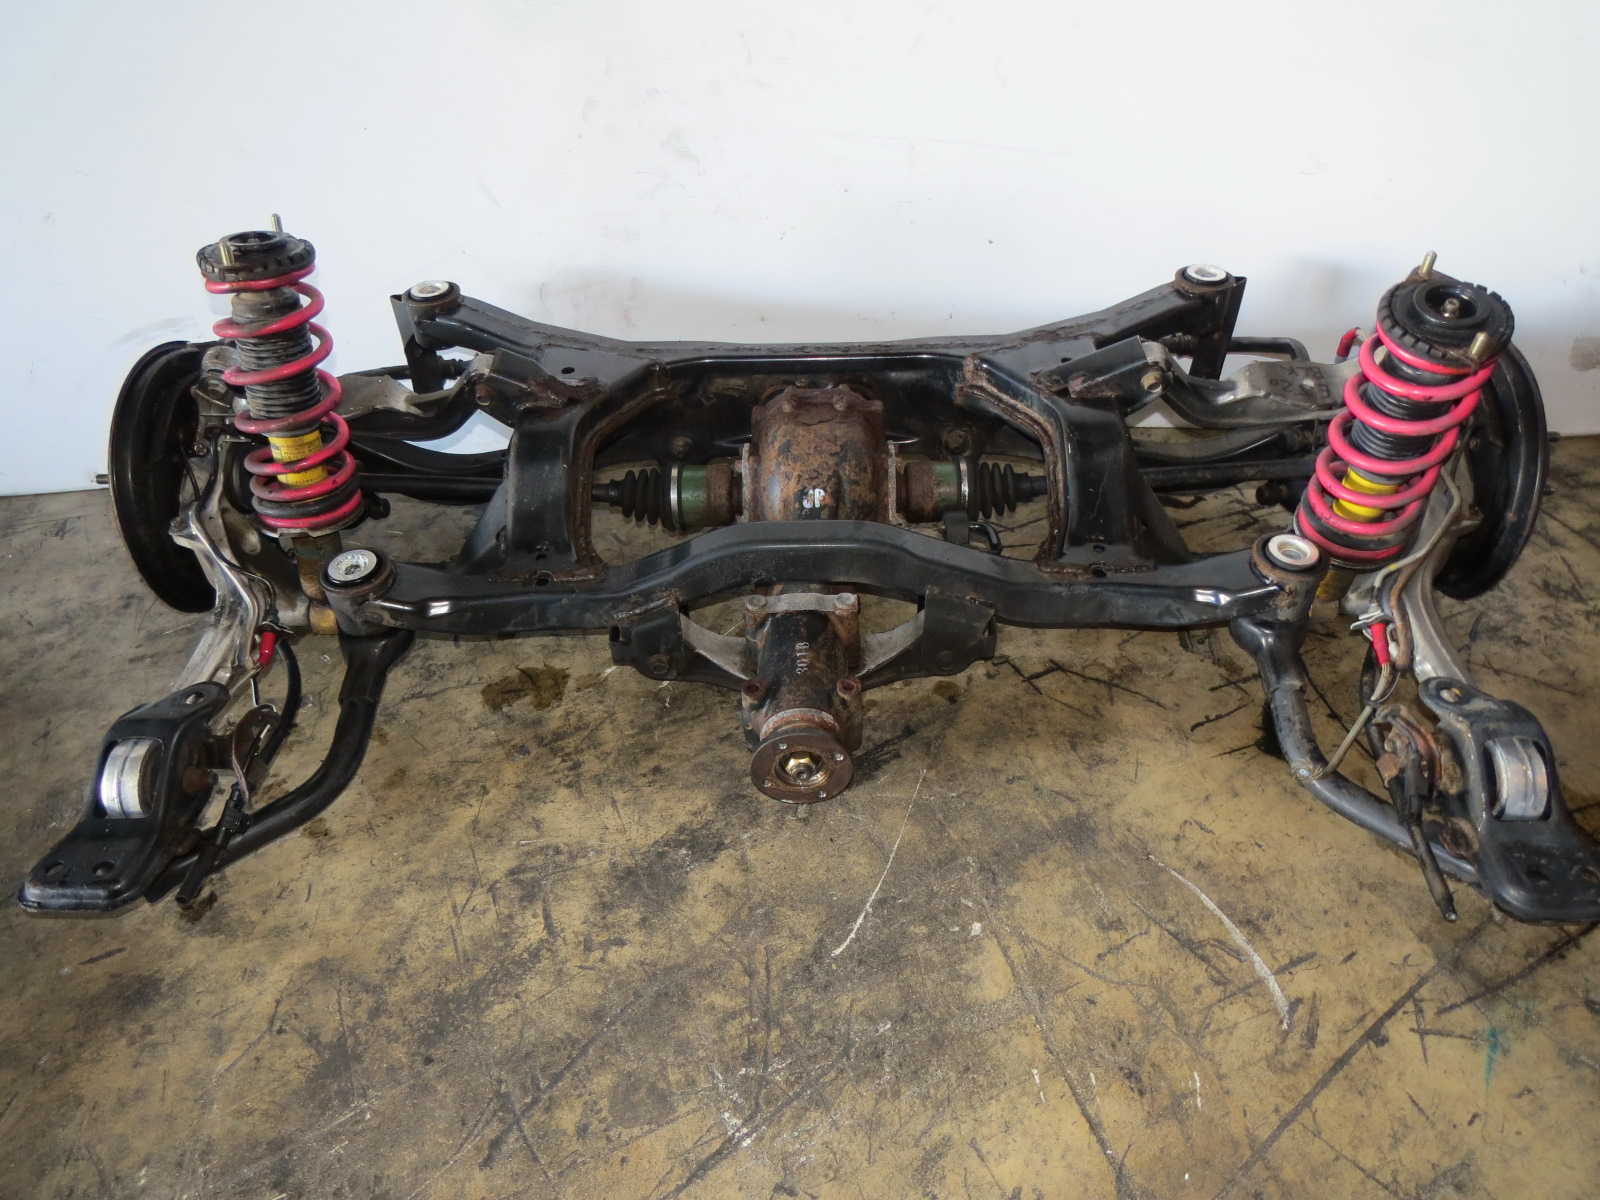 Miami Engine Import Turbo Manual 5 Speed Transmission Wiring Harness Ecu Vg30dett Jdm Subaru Wrx Differential Axels Suspensions Sub Frame Ej20t Sold As Is